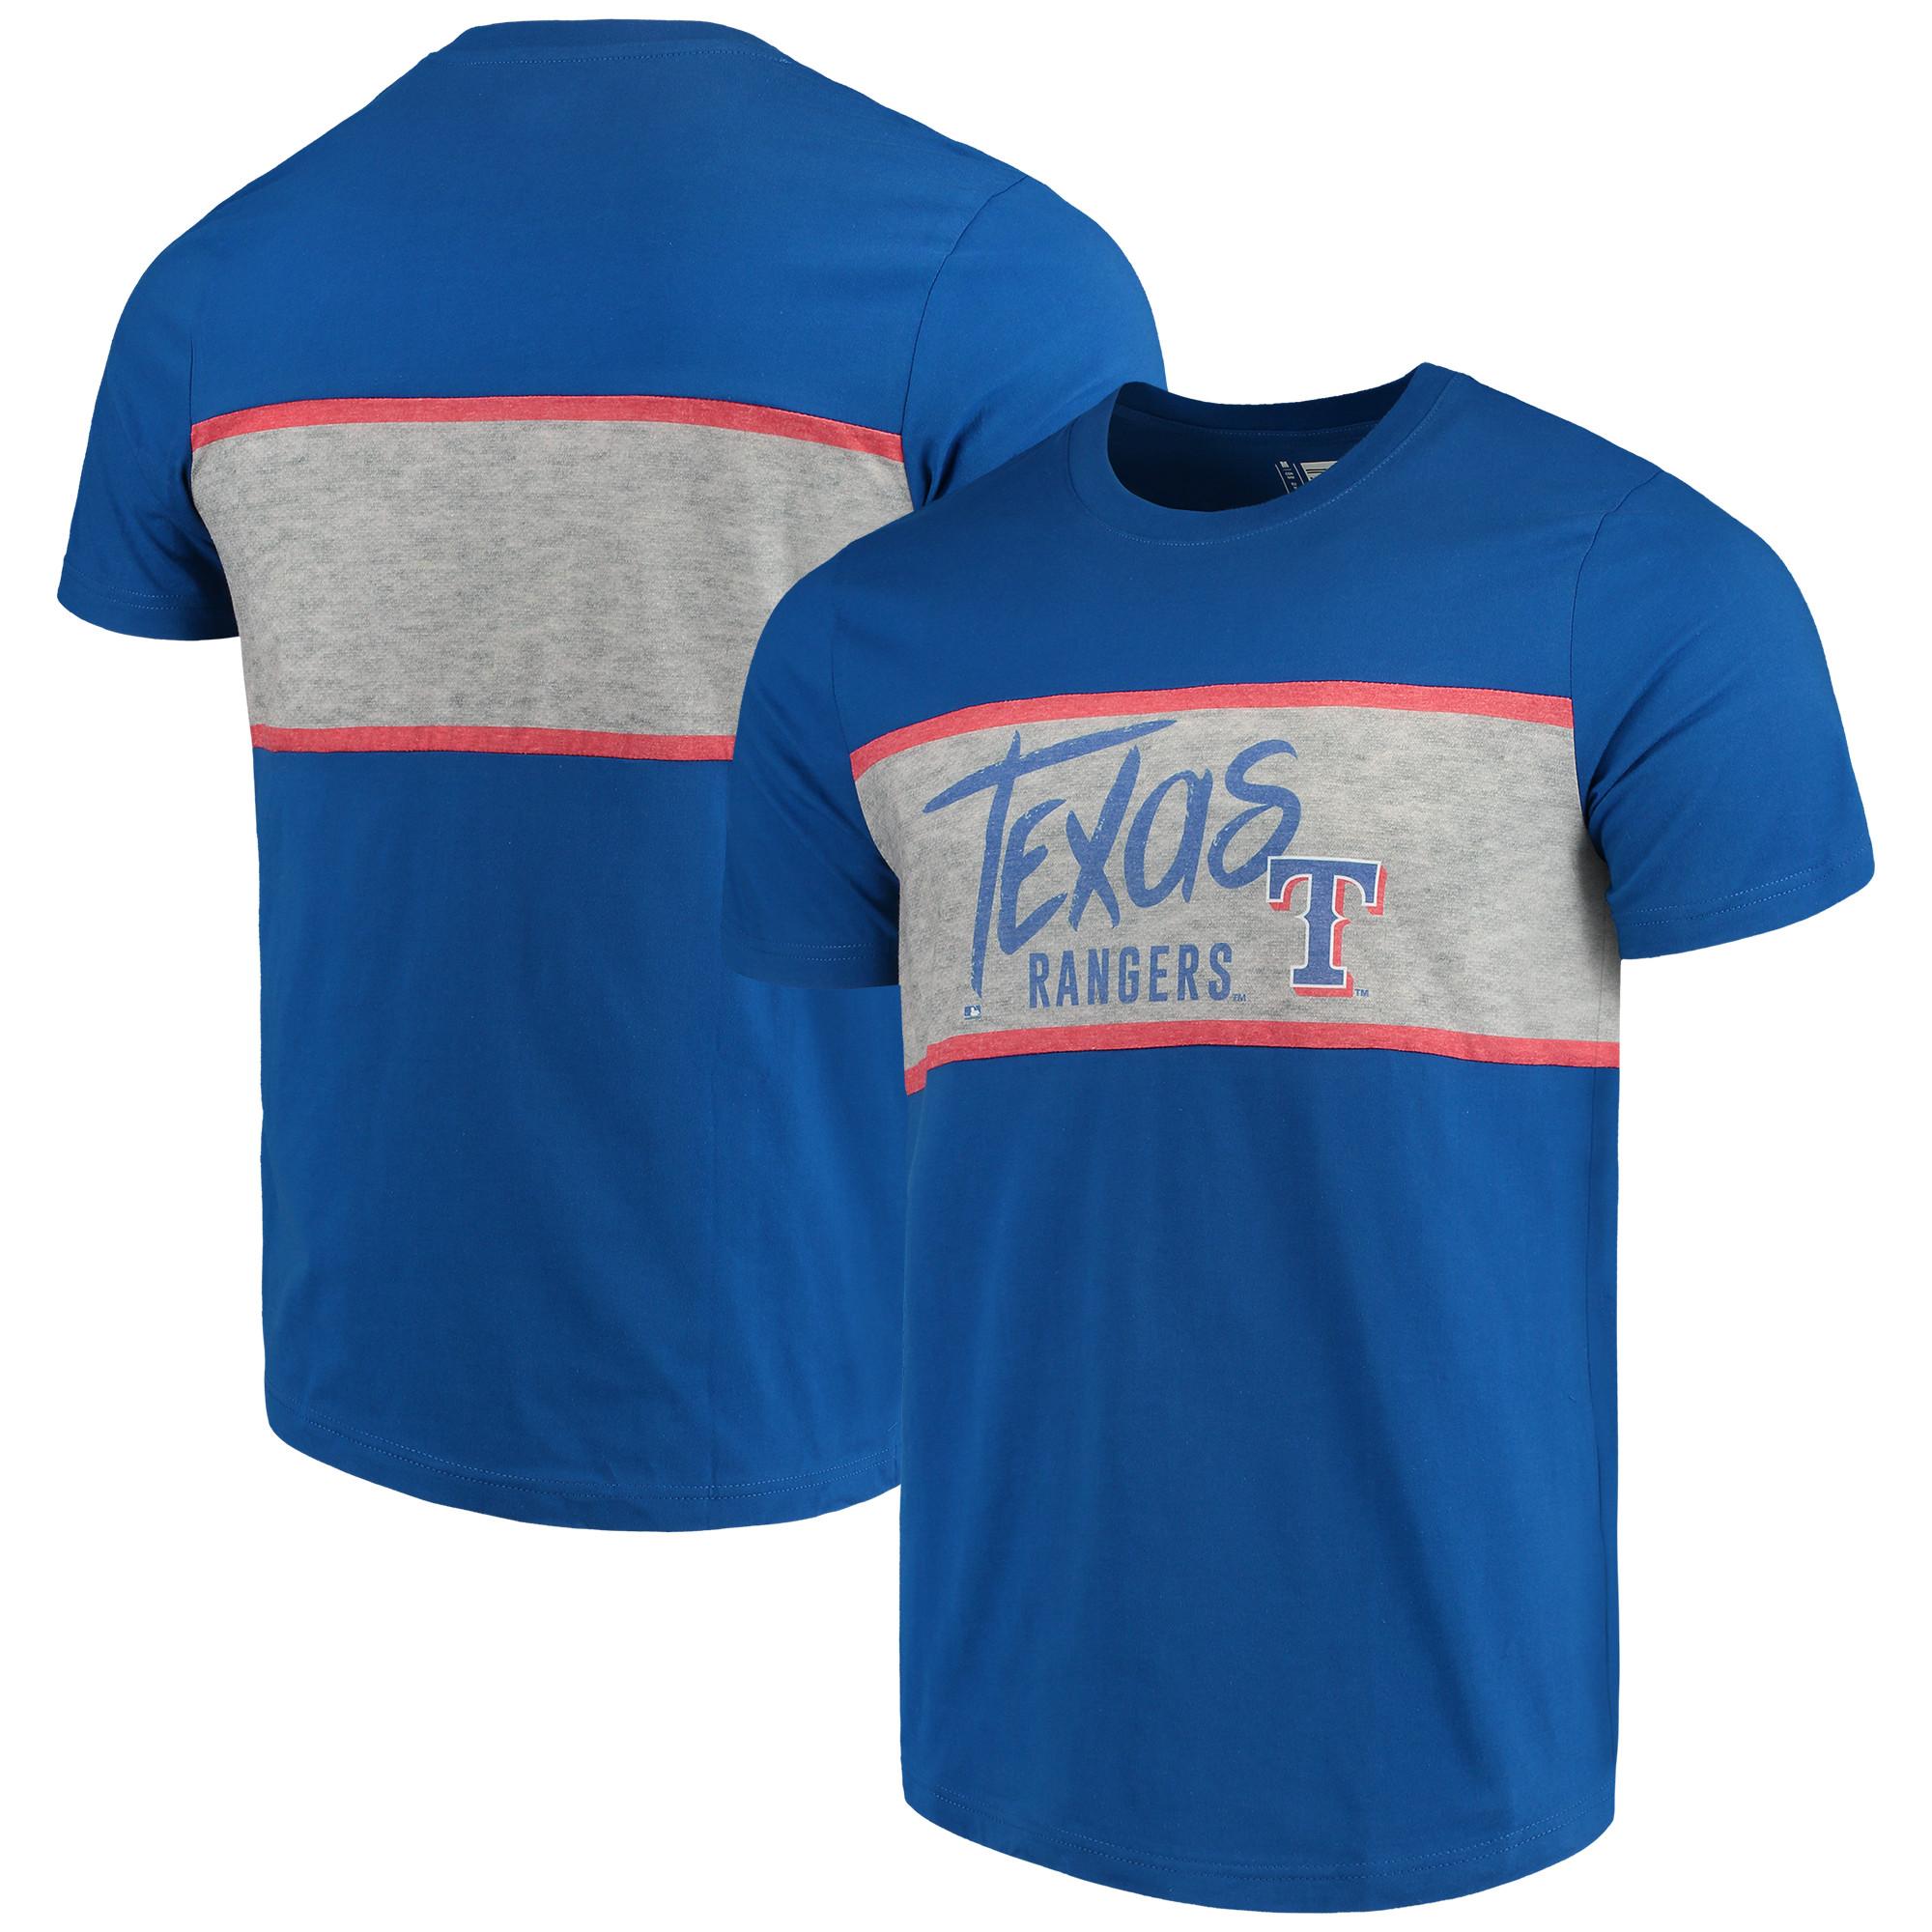 Texas Rangers Wordmark Panel T-Shirt - Royal